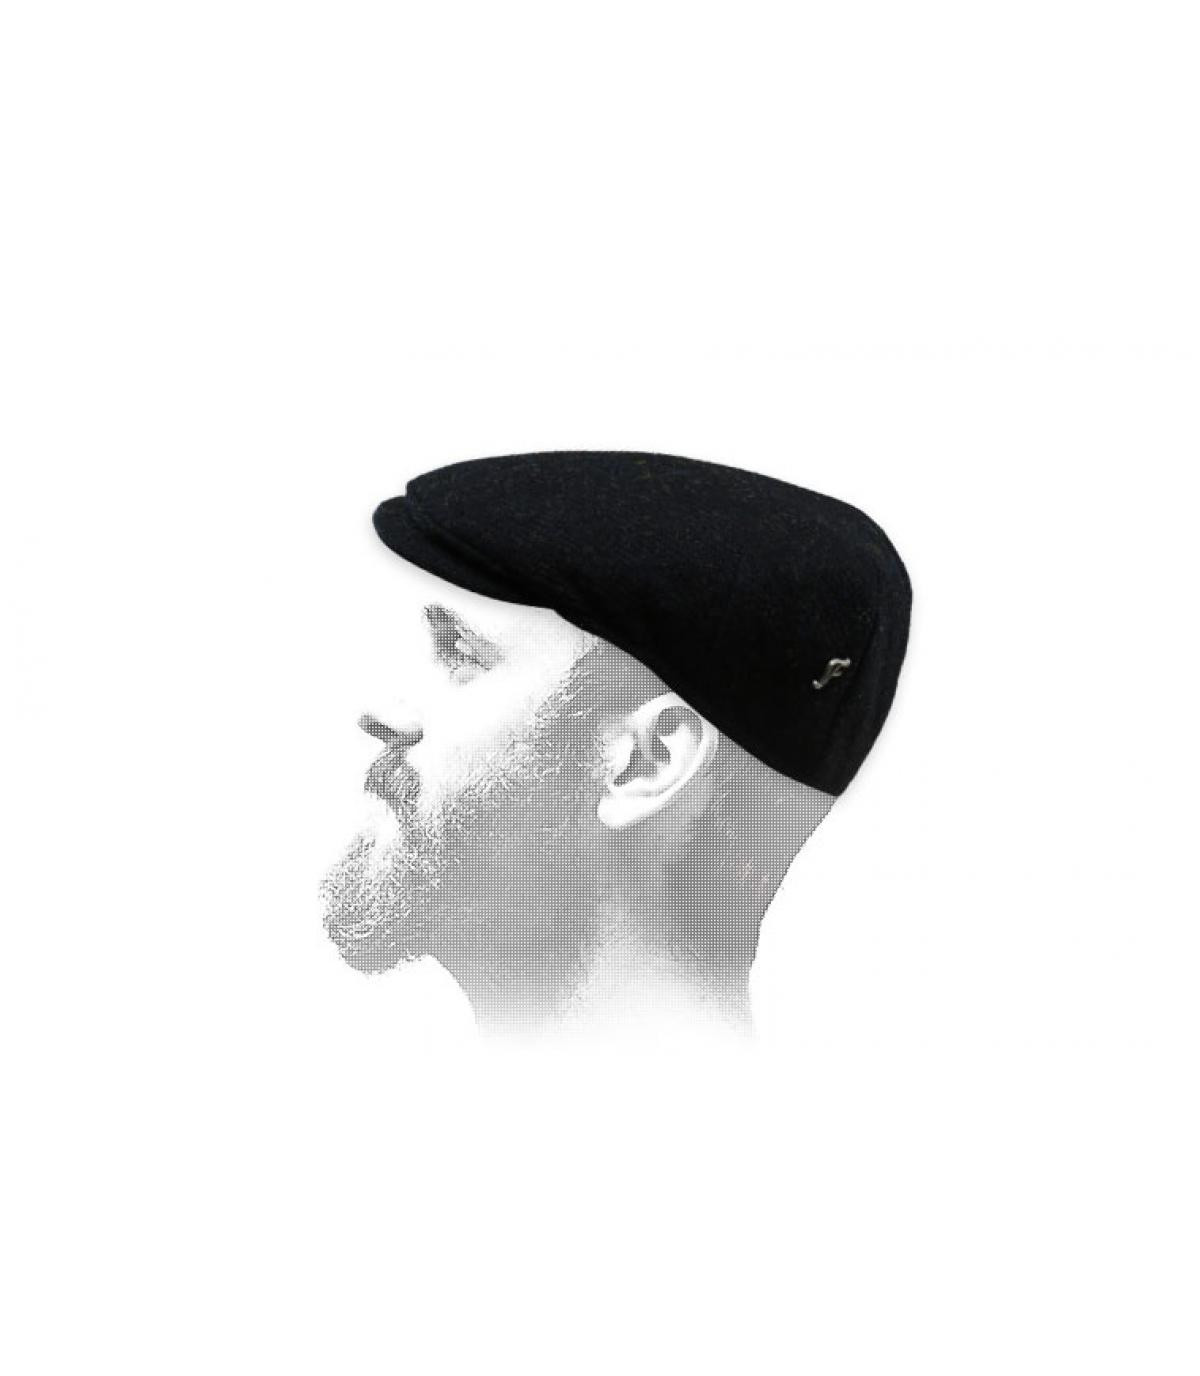 béret noir tweed Fléchet